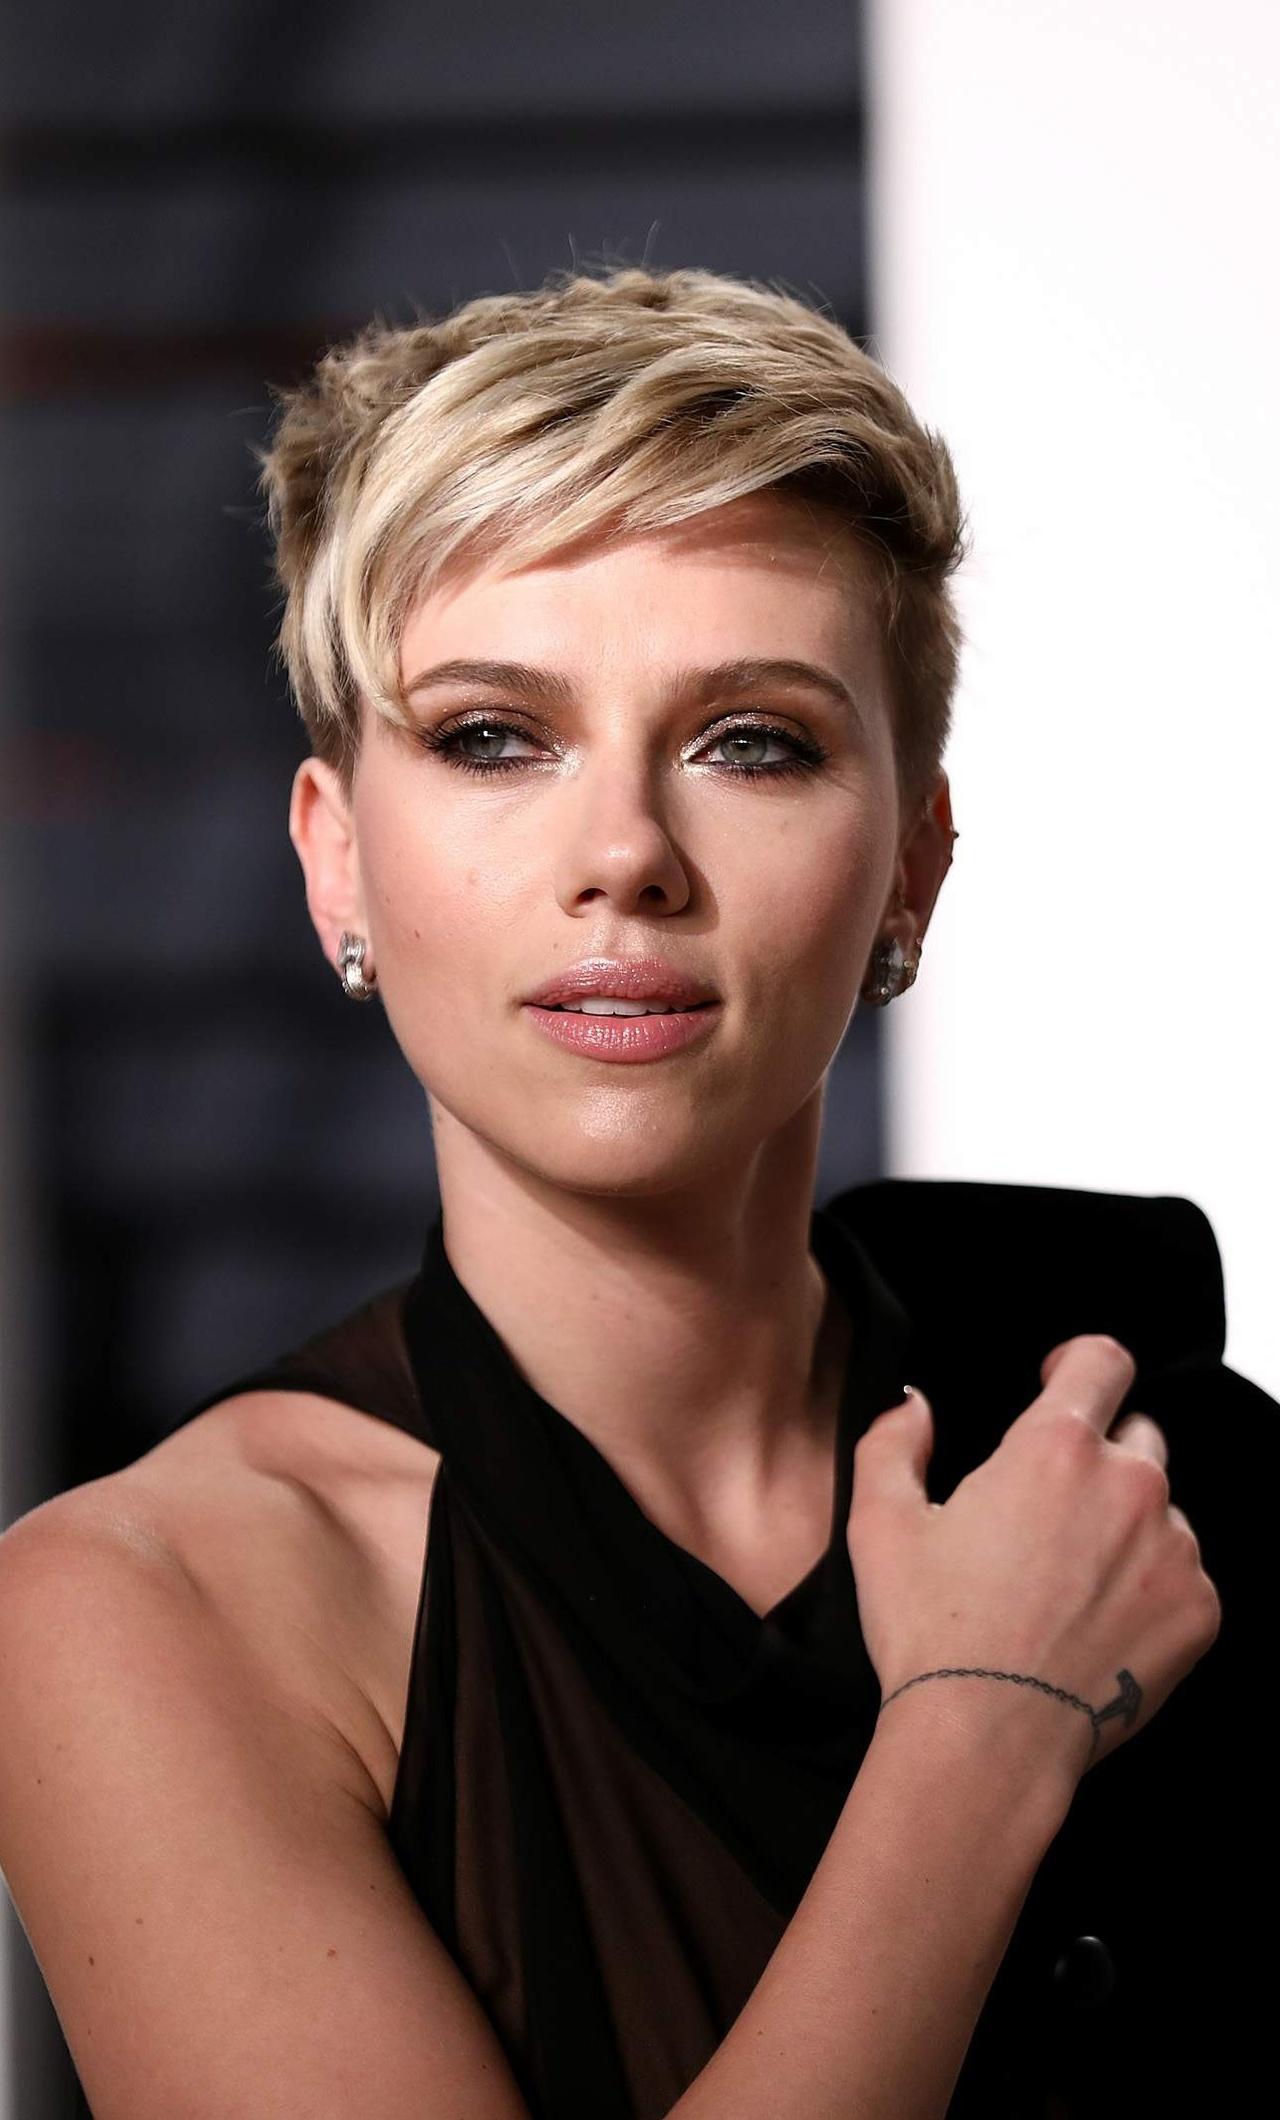 Think, Scarlett johansson vanity fair apologise, but